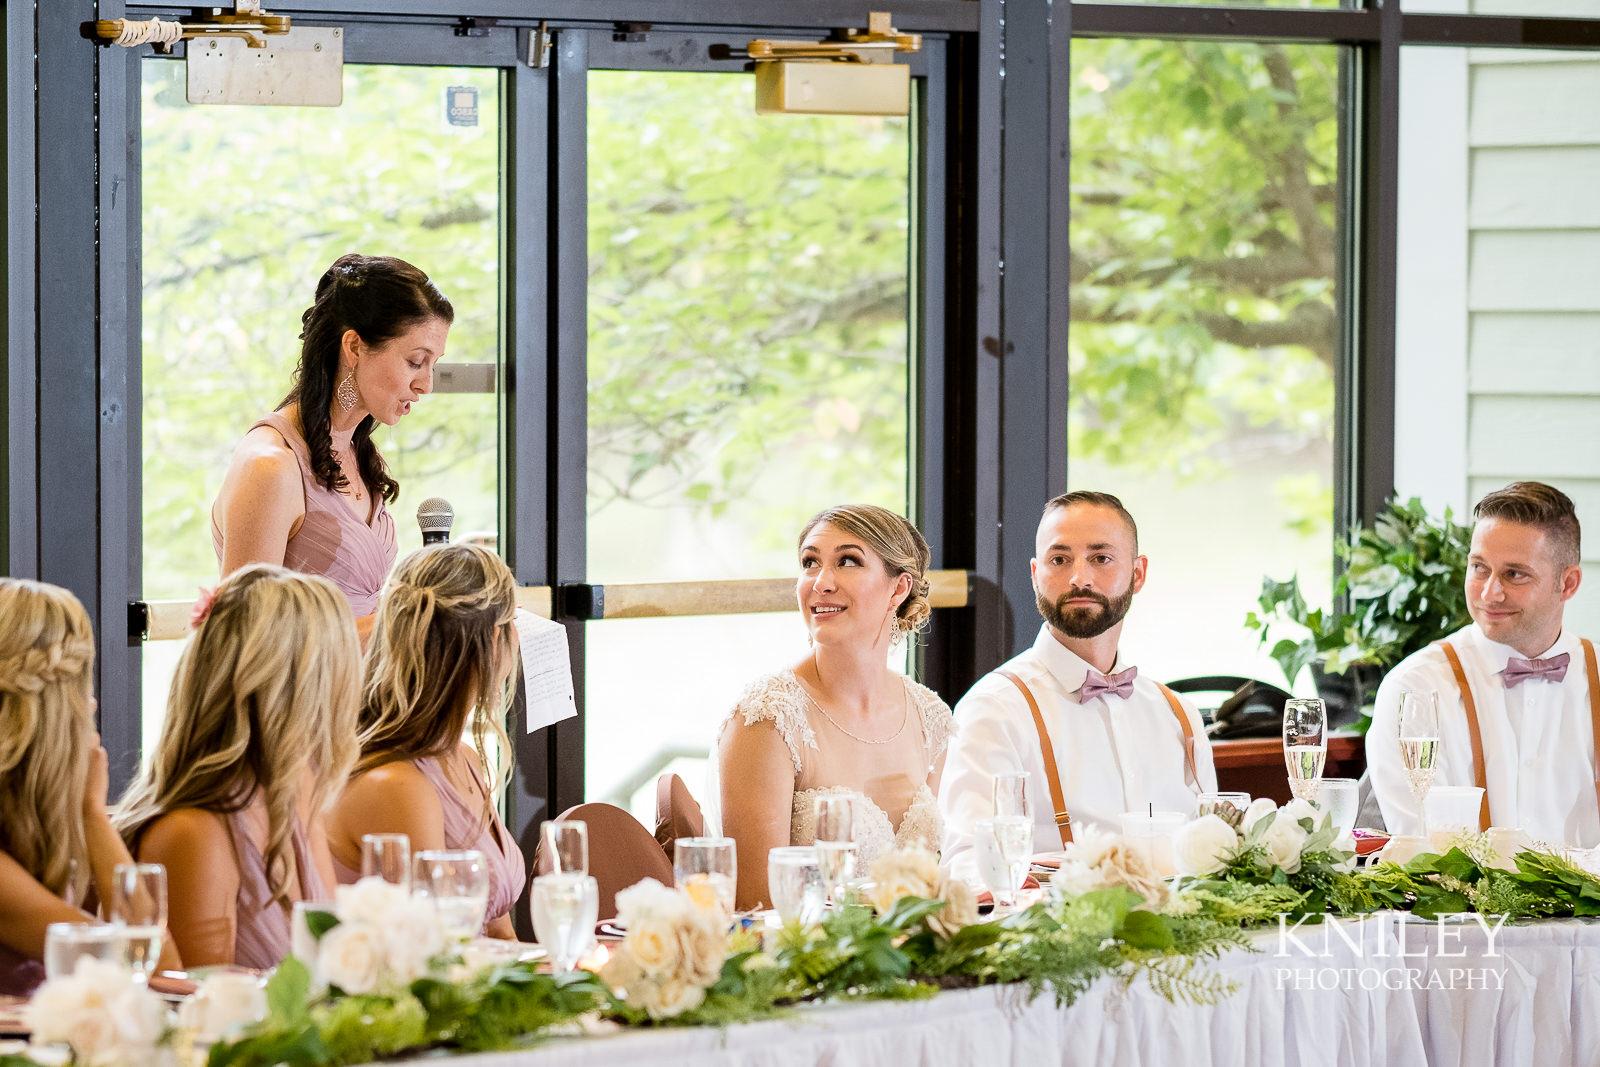 083 - Ontario Golf Club Wedding Pictures - XT2B8941.jpg